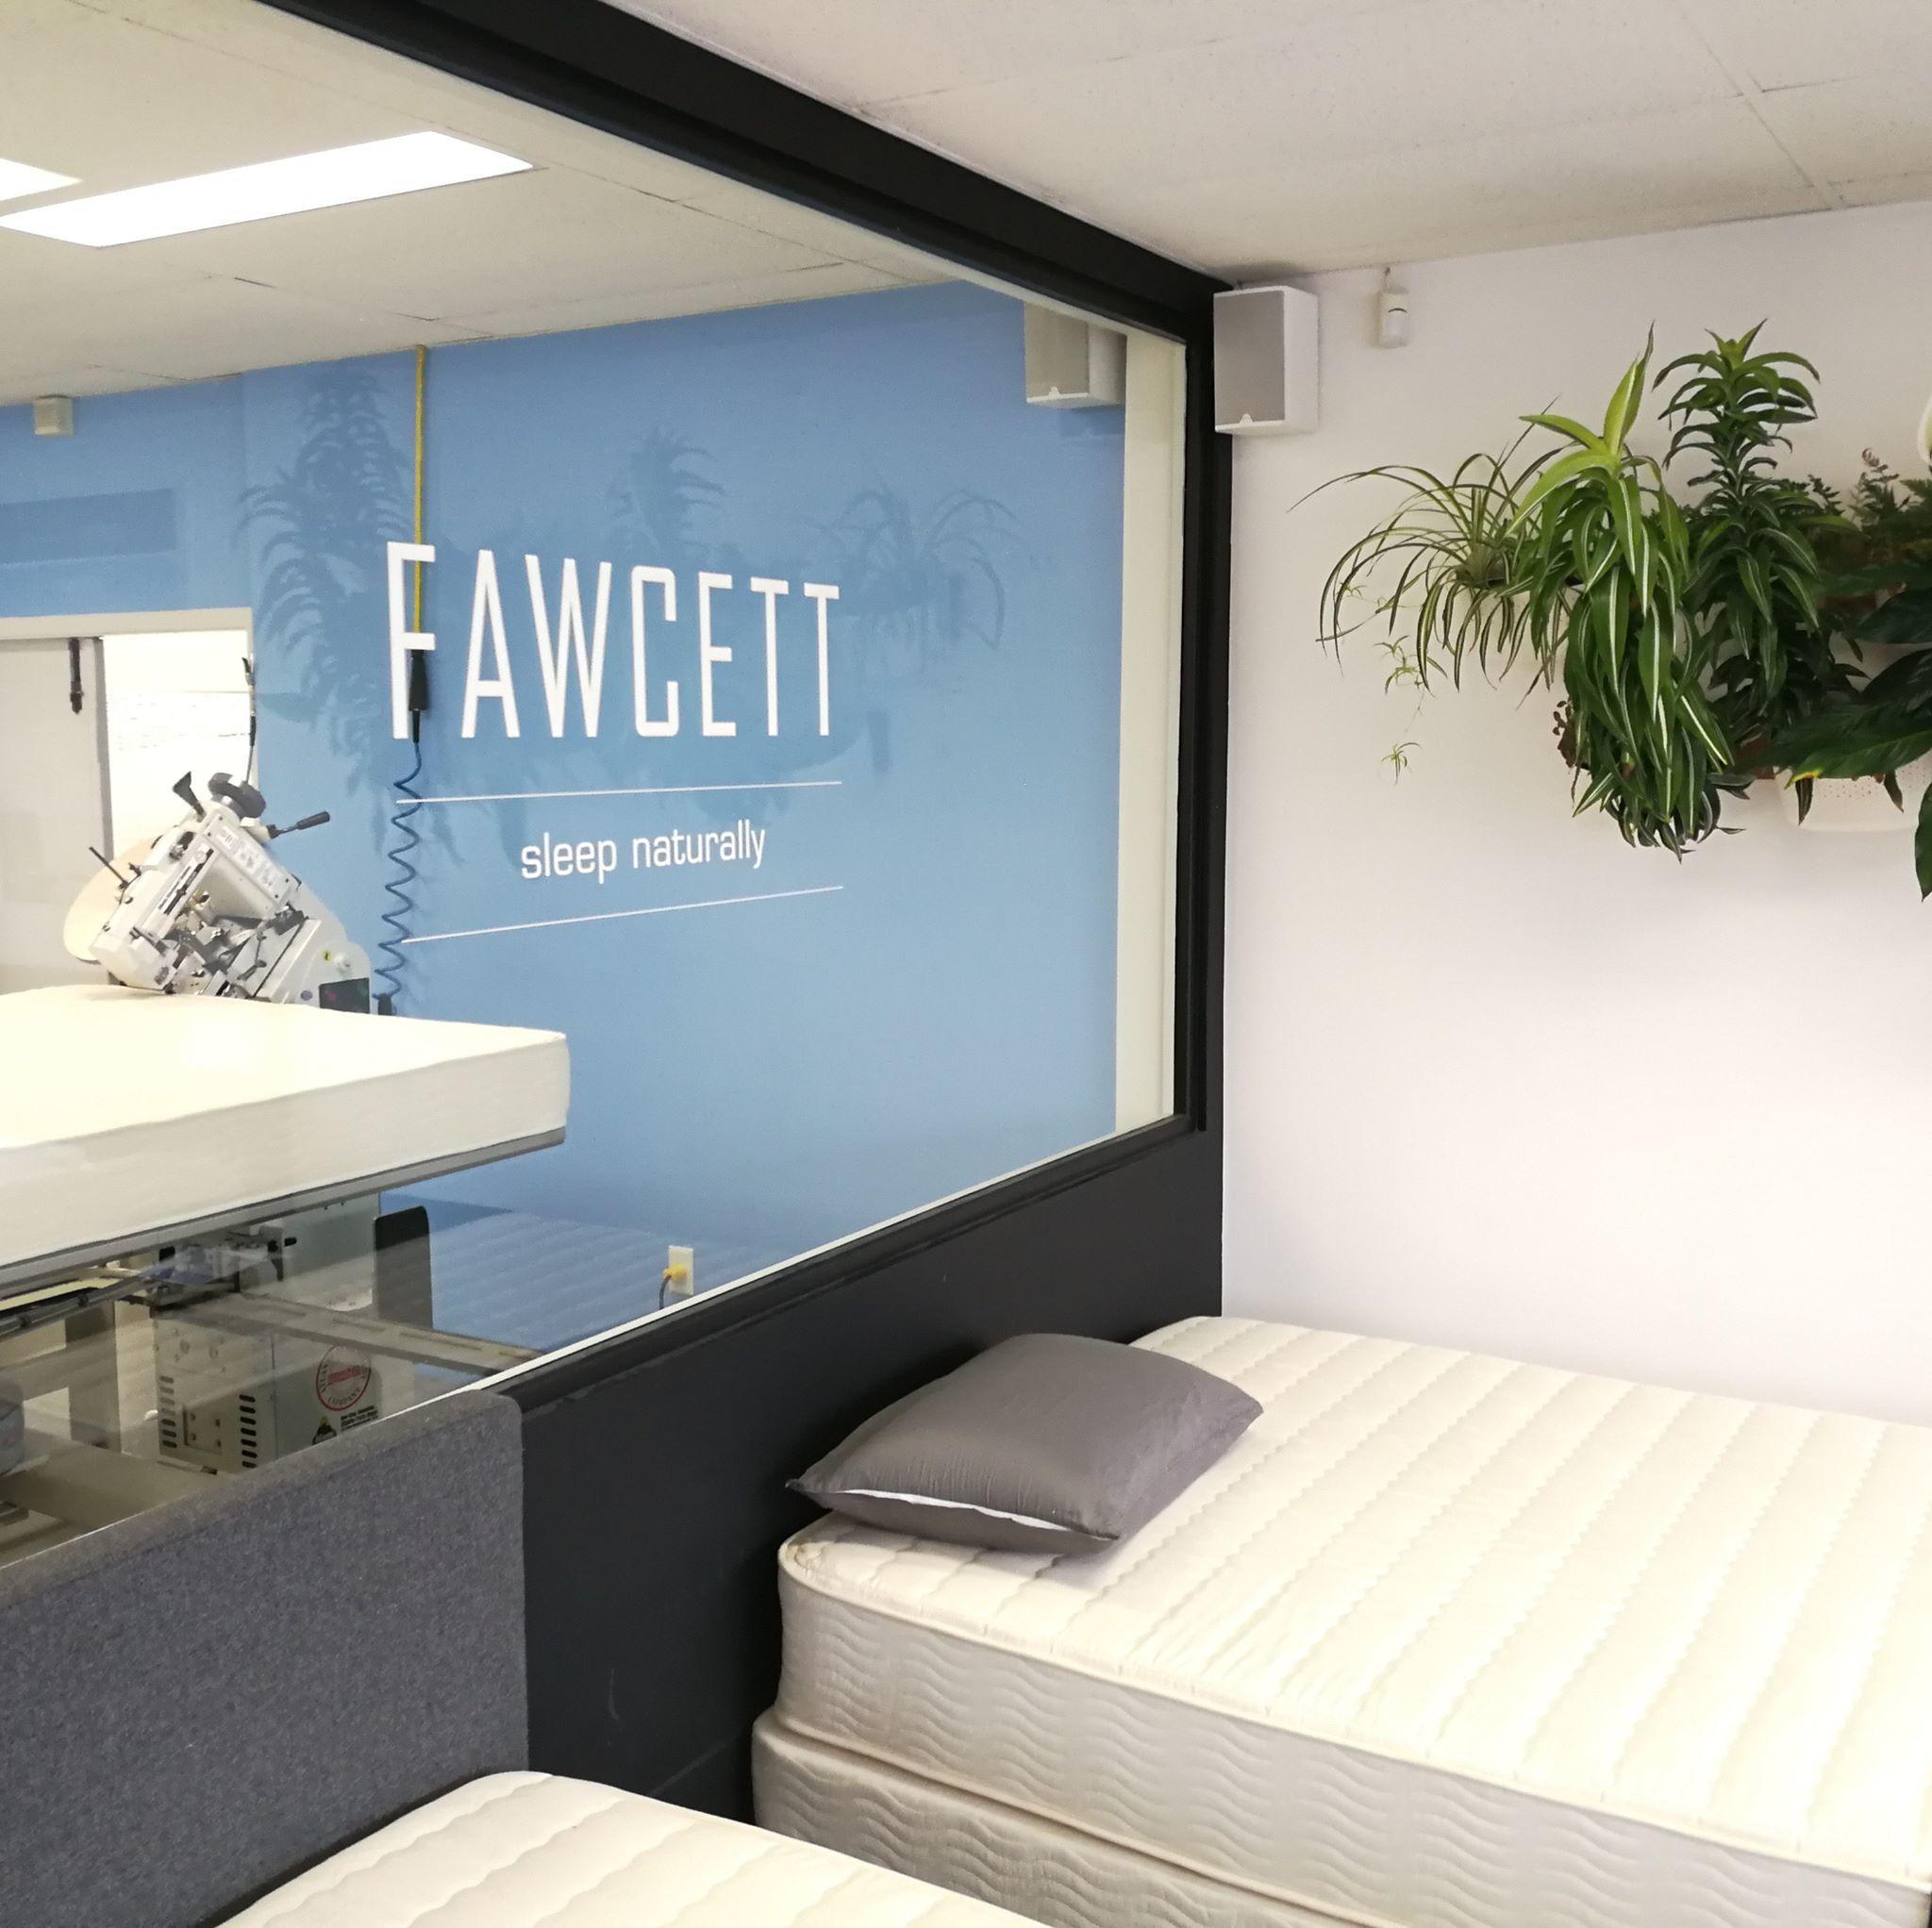 Fawcett Mattress Natural Talalay Latex Pillow Store Victoria Bc